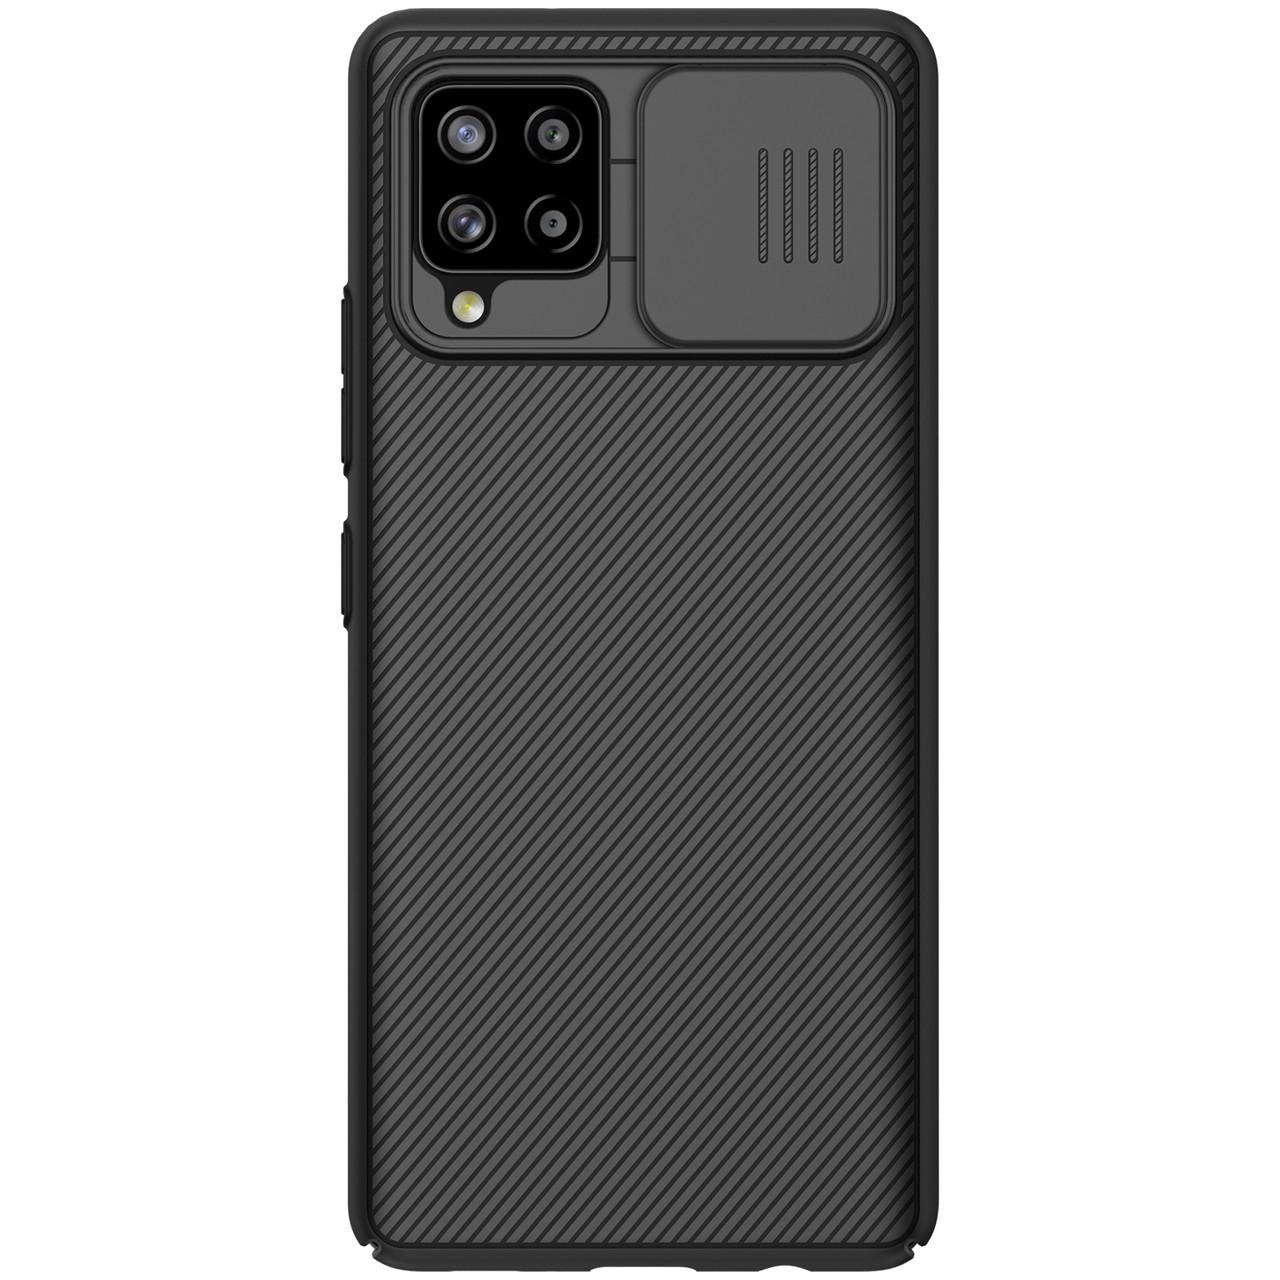 Захисний чохол Nillkin для Samsung Galaxy A42 5G (CamShield Case) з захистом камери